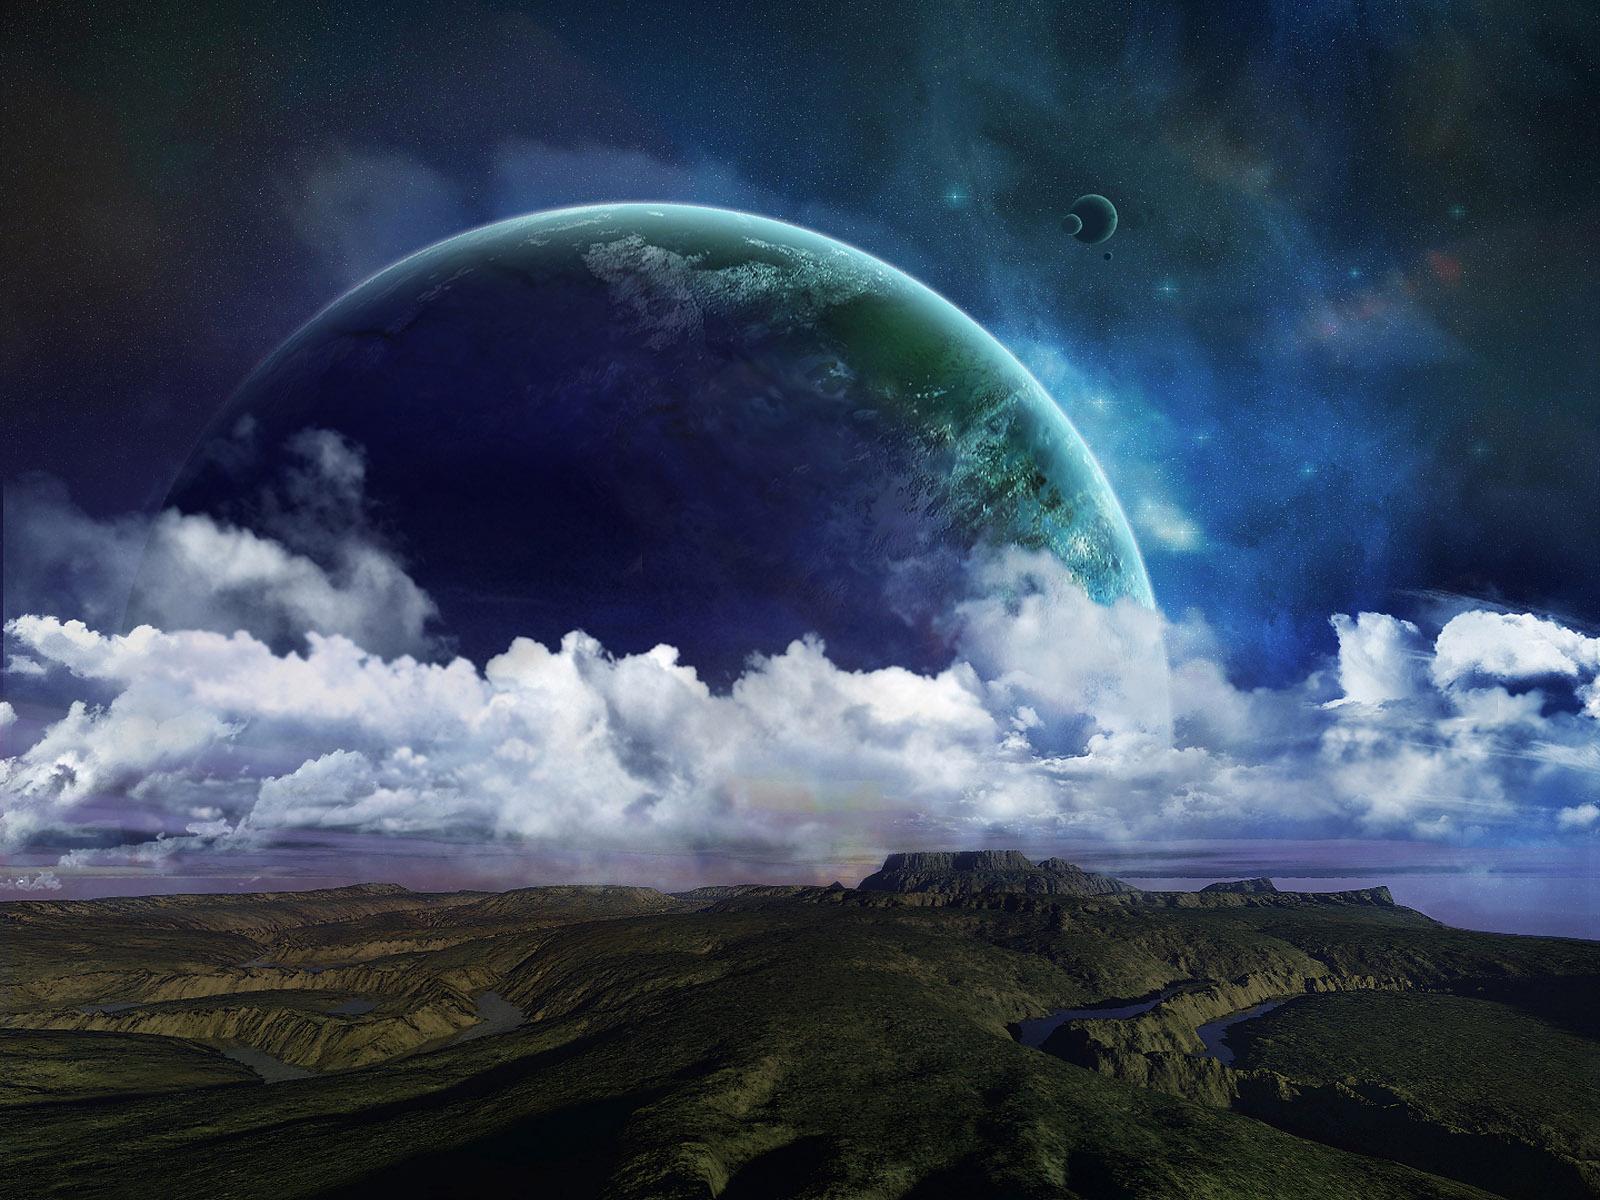 http://2.bp.blogspot.com/-nukpggPWWMc/TkN8EhGM6KI/AAAAAAAAAQc/ptr1Nj1yyyw/s1600/Space+Art+Wallpapers+00.jpg